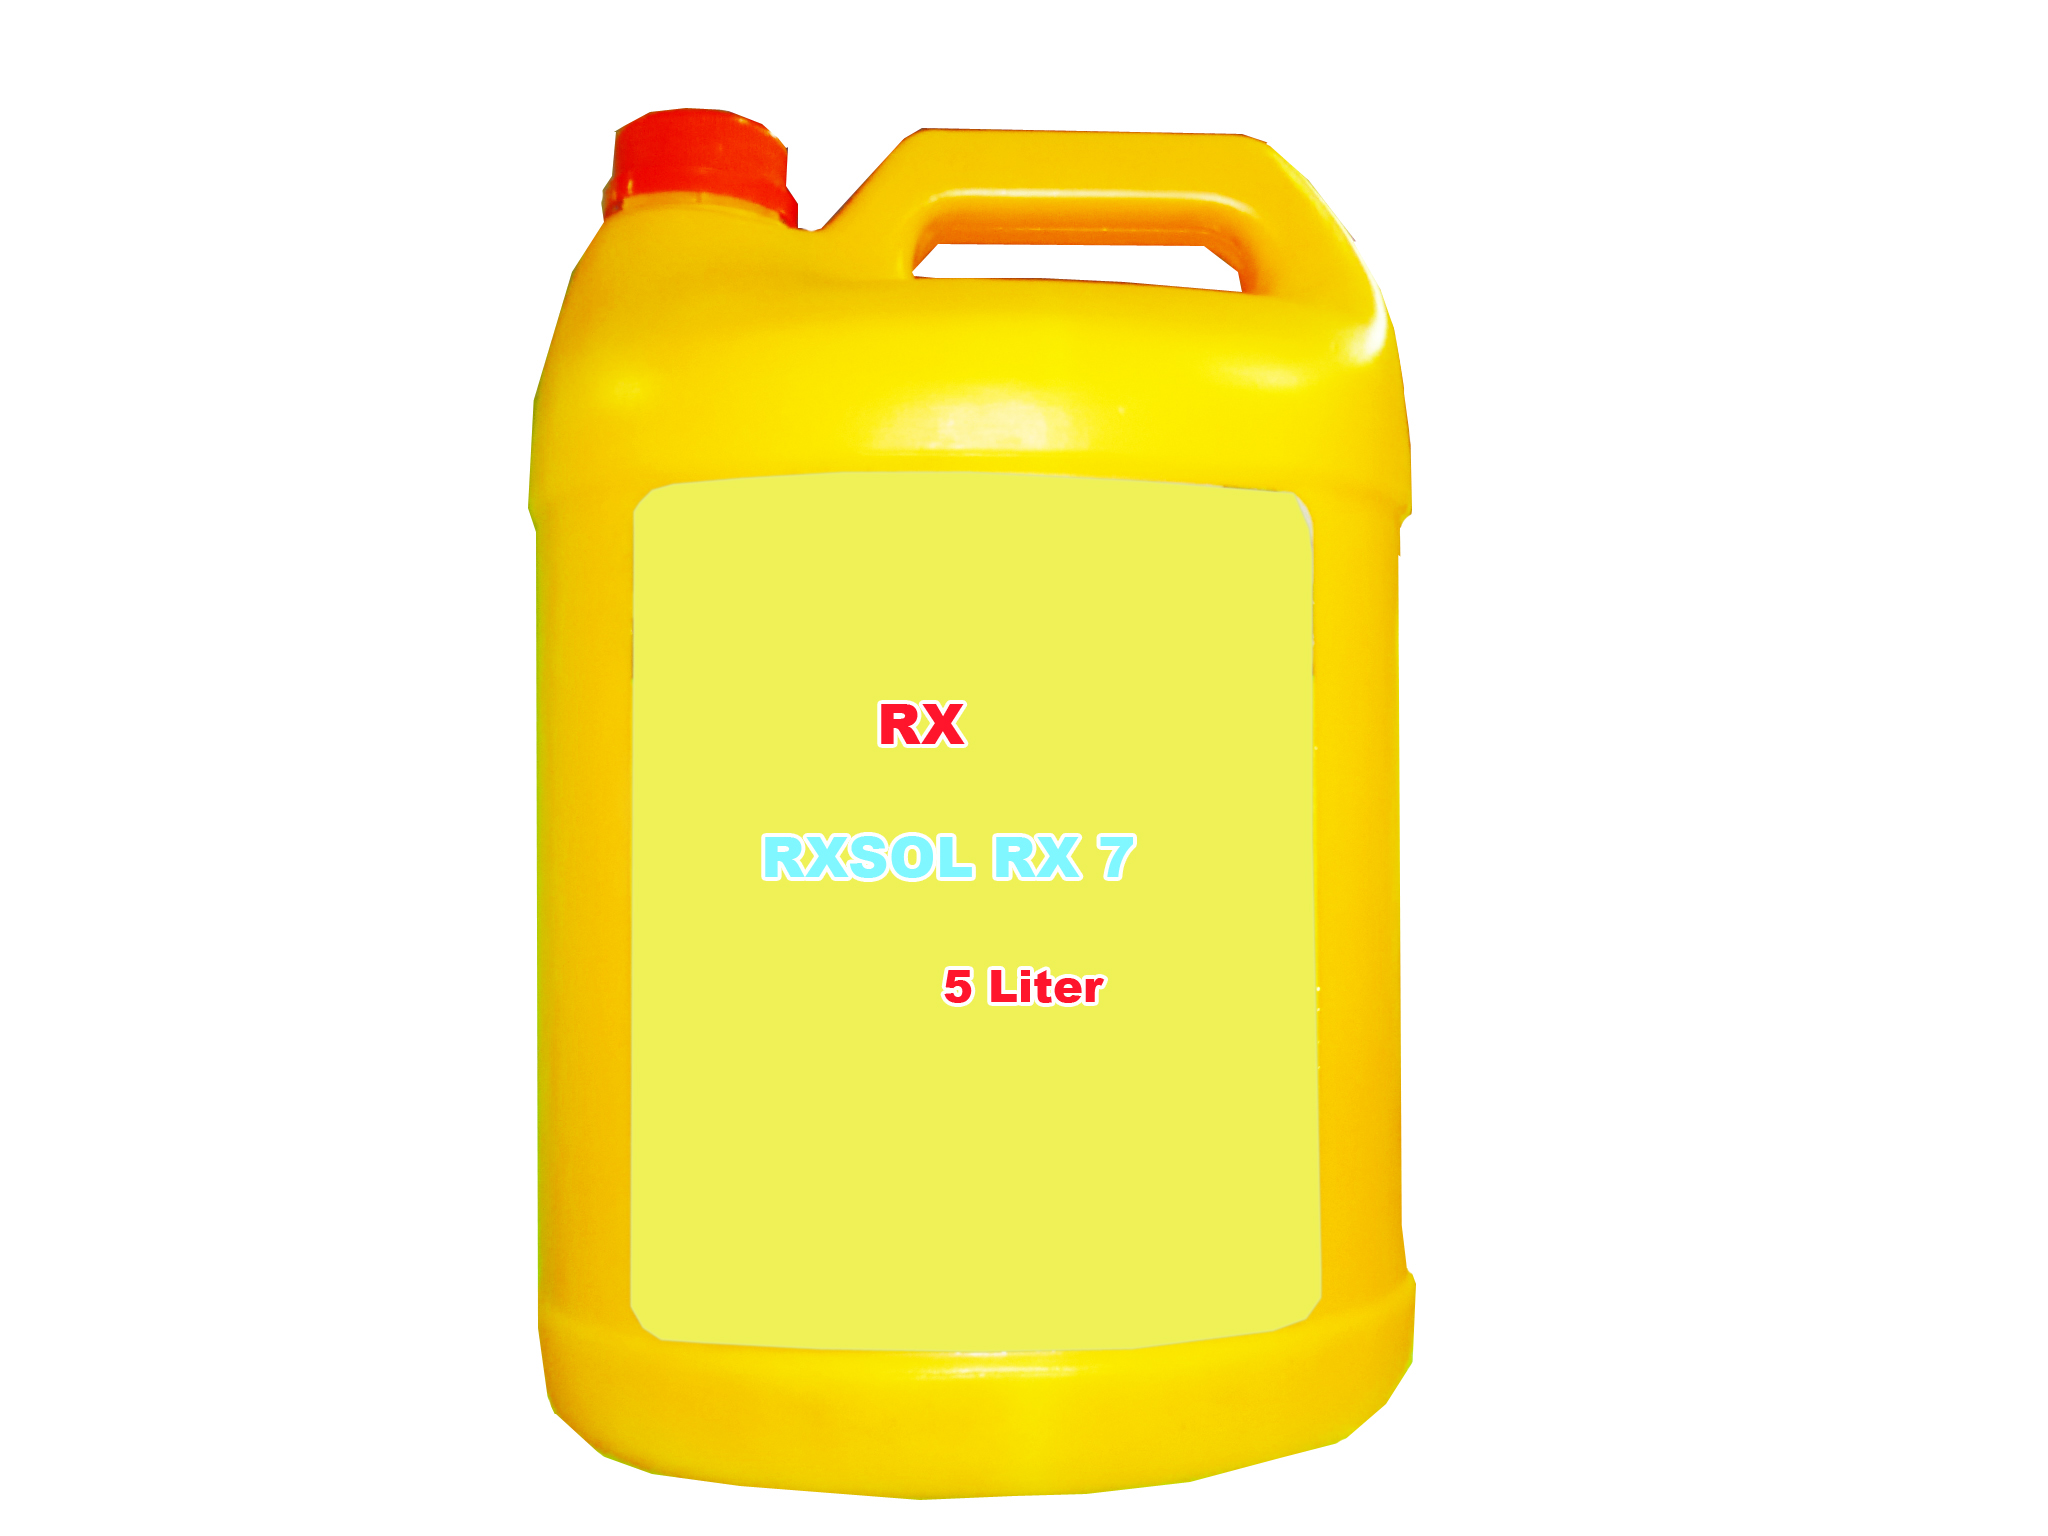 Acidic Cleaner Manufacturer Supplier Exporter